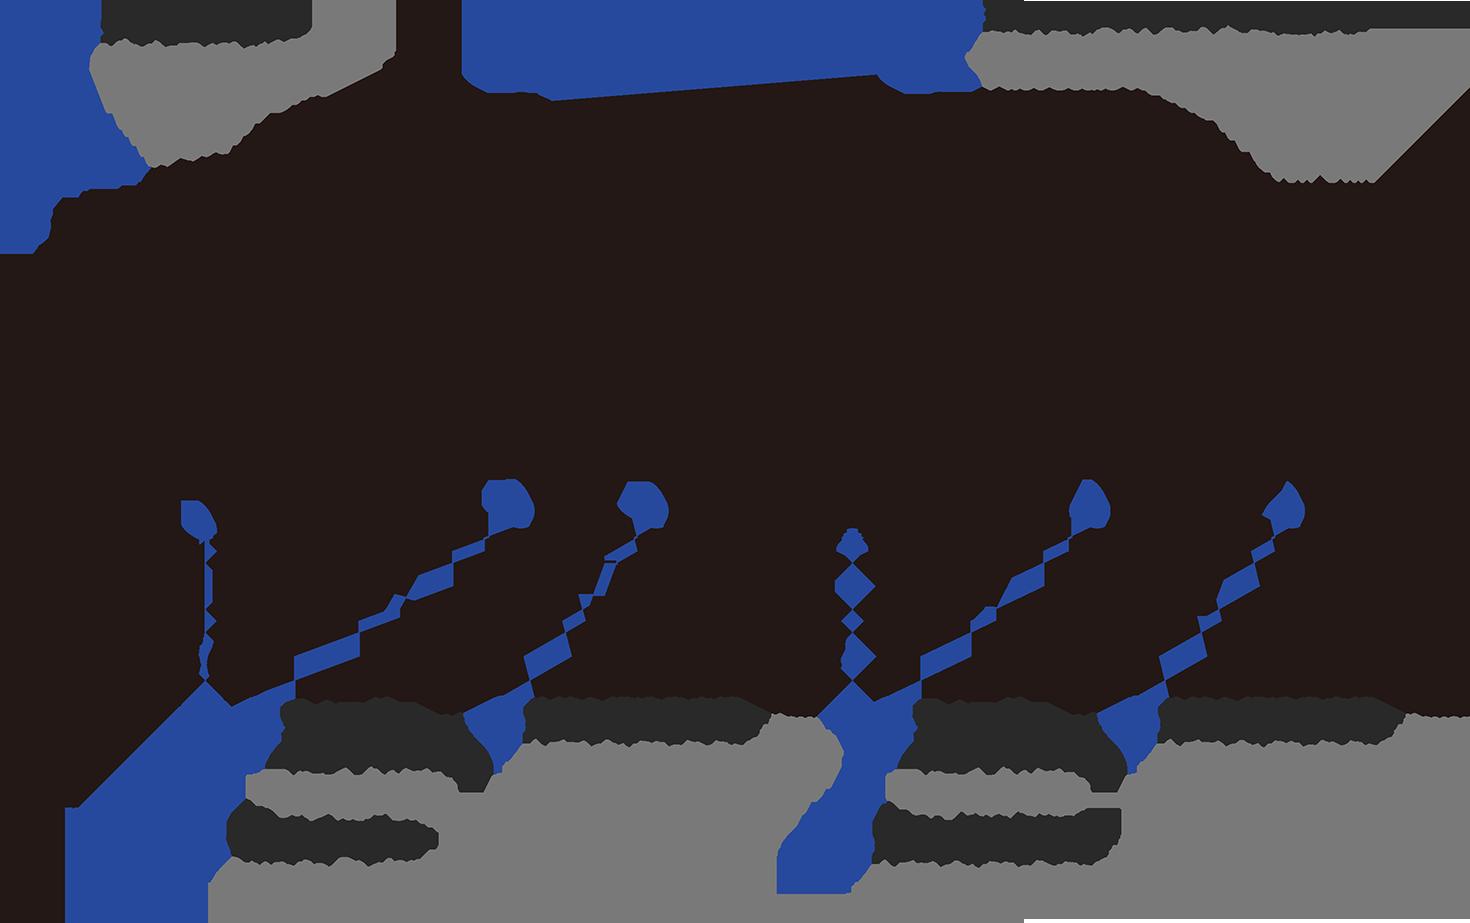 Grand coater unit